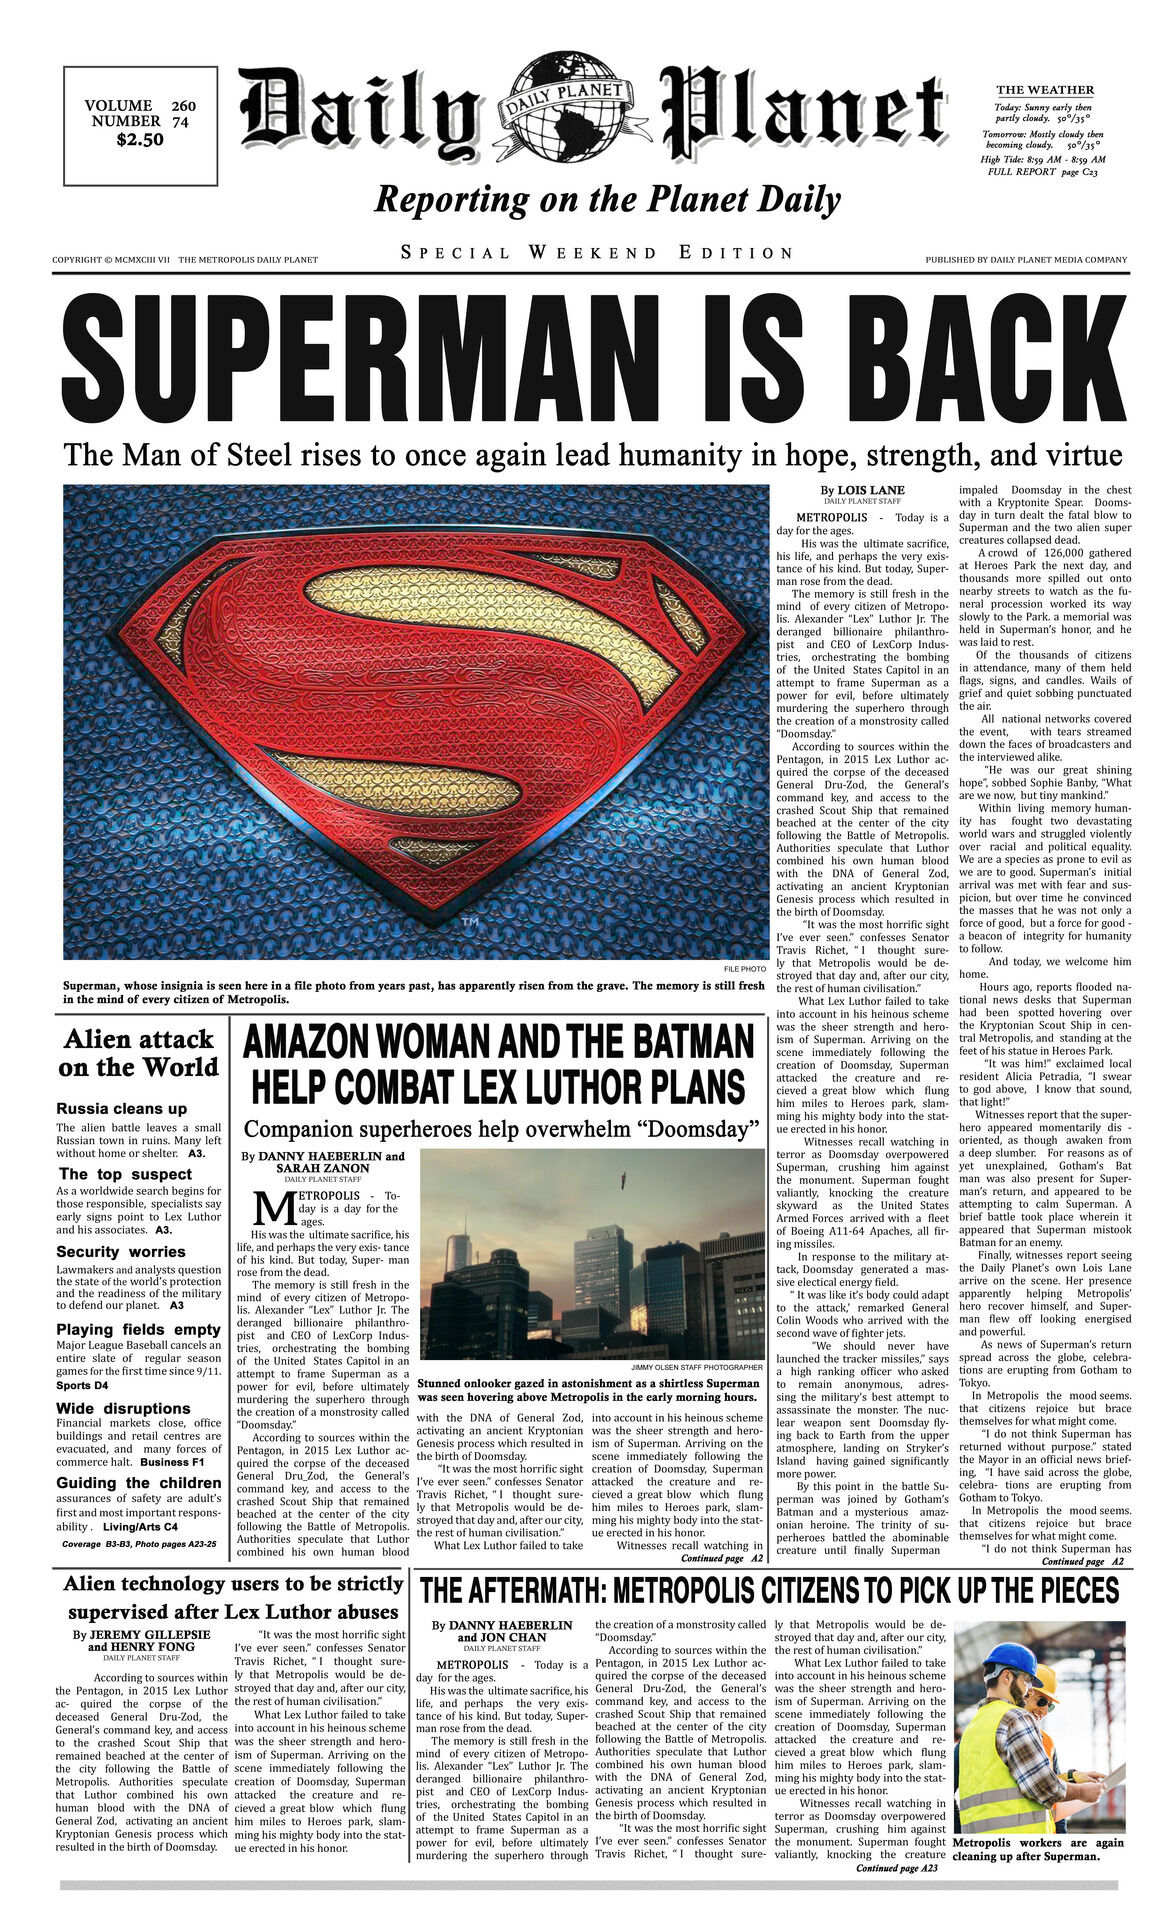 Newspaper from Shazam!.jpg